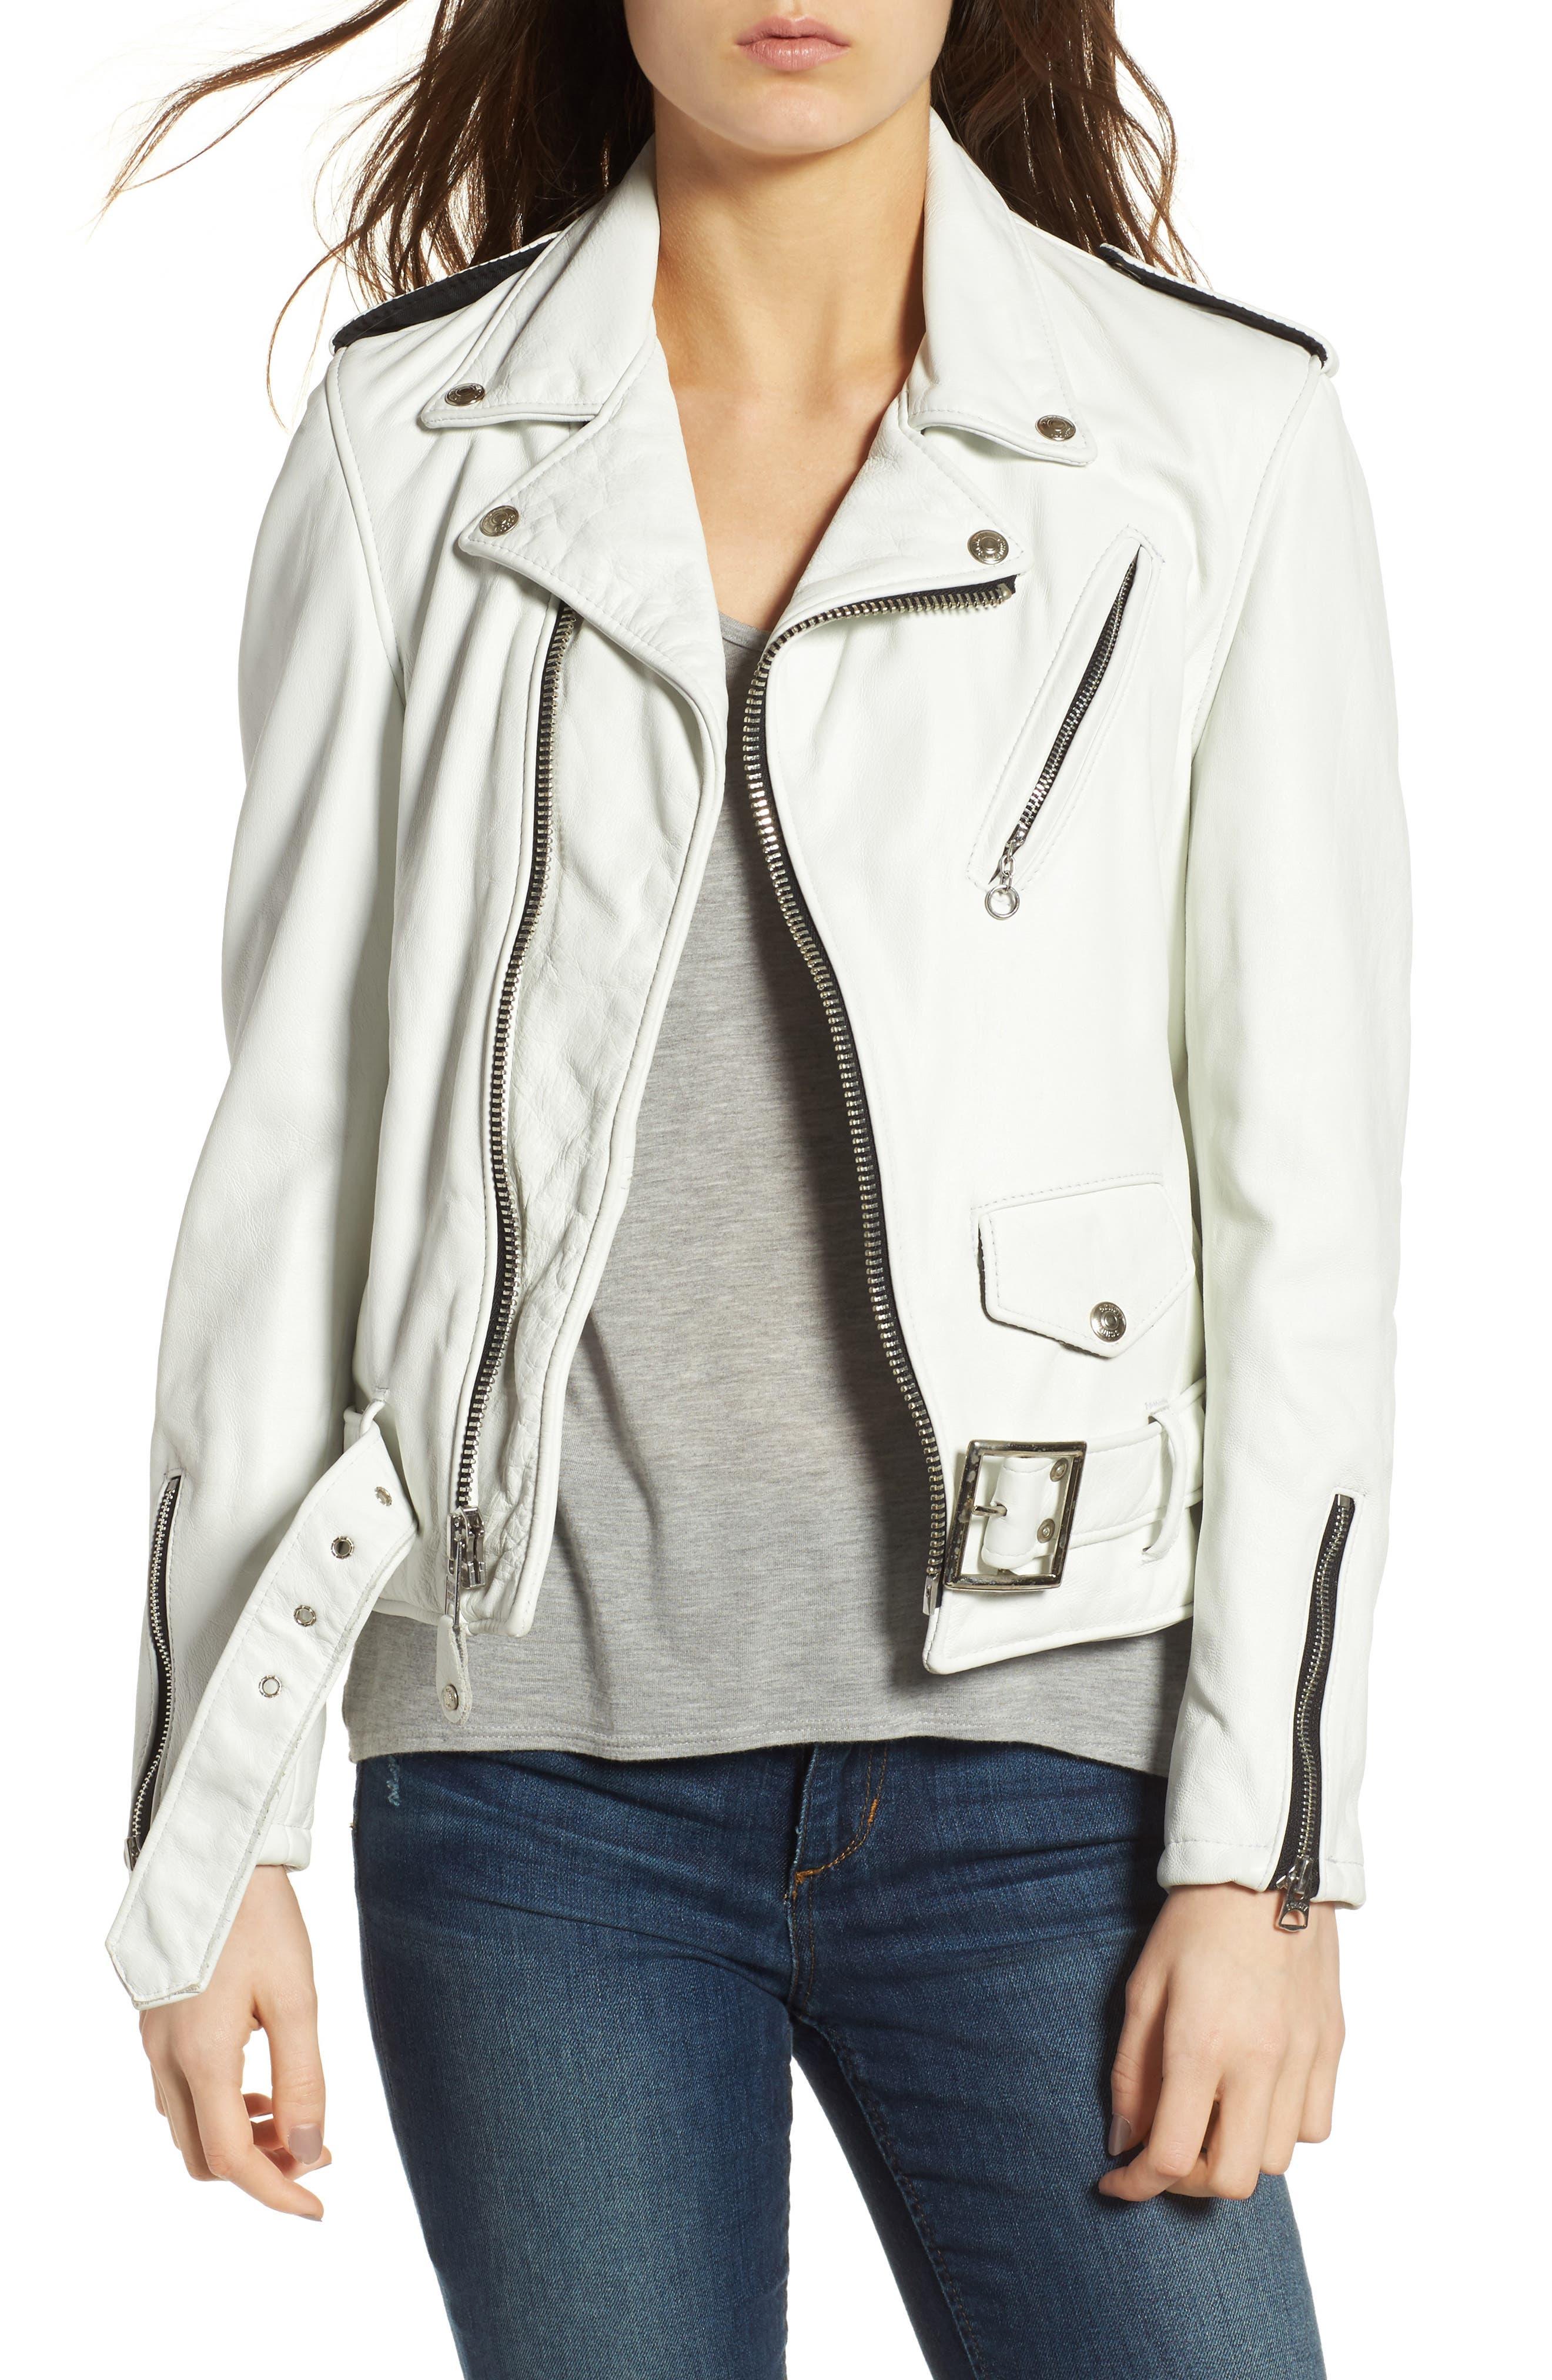 Boyfriend Leather Jacket in White